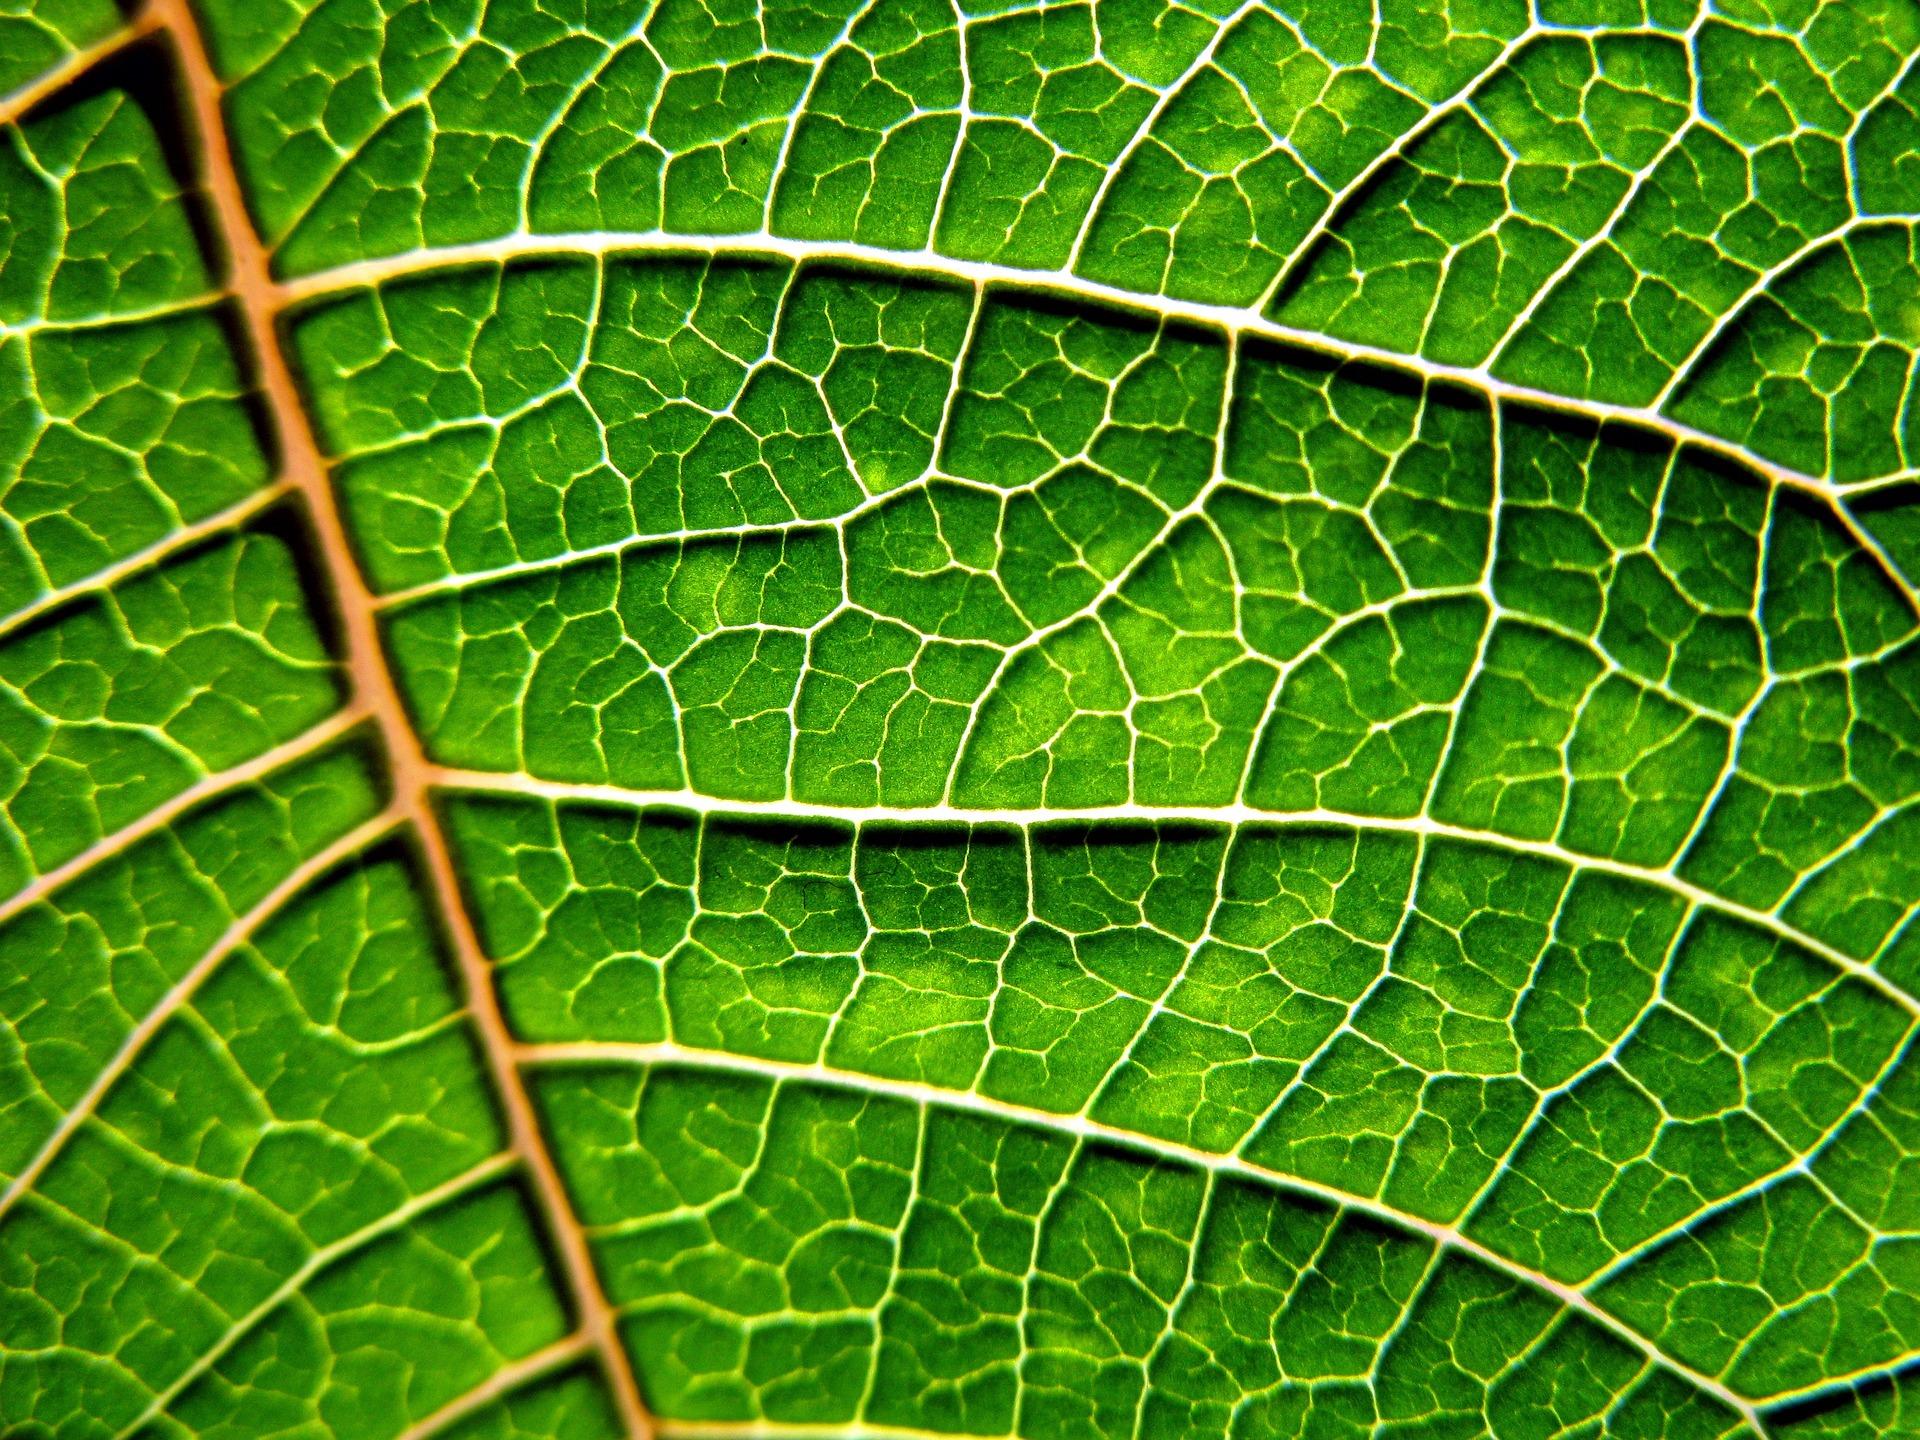 gree_leaf_plant-up